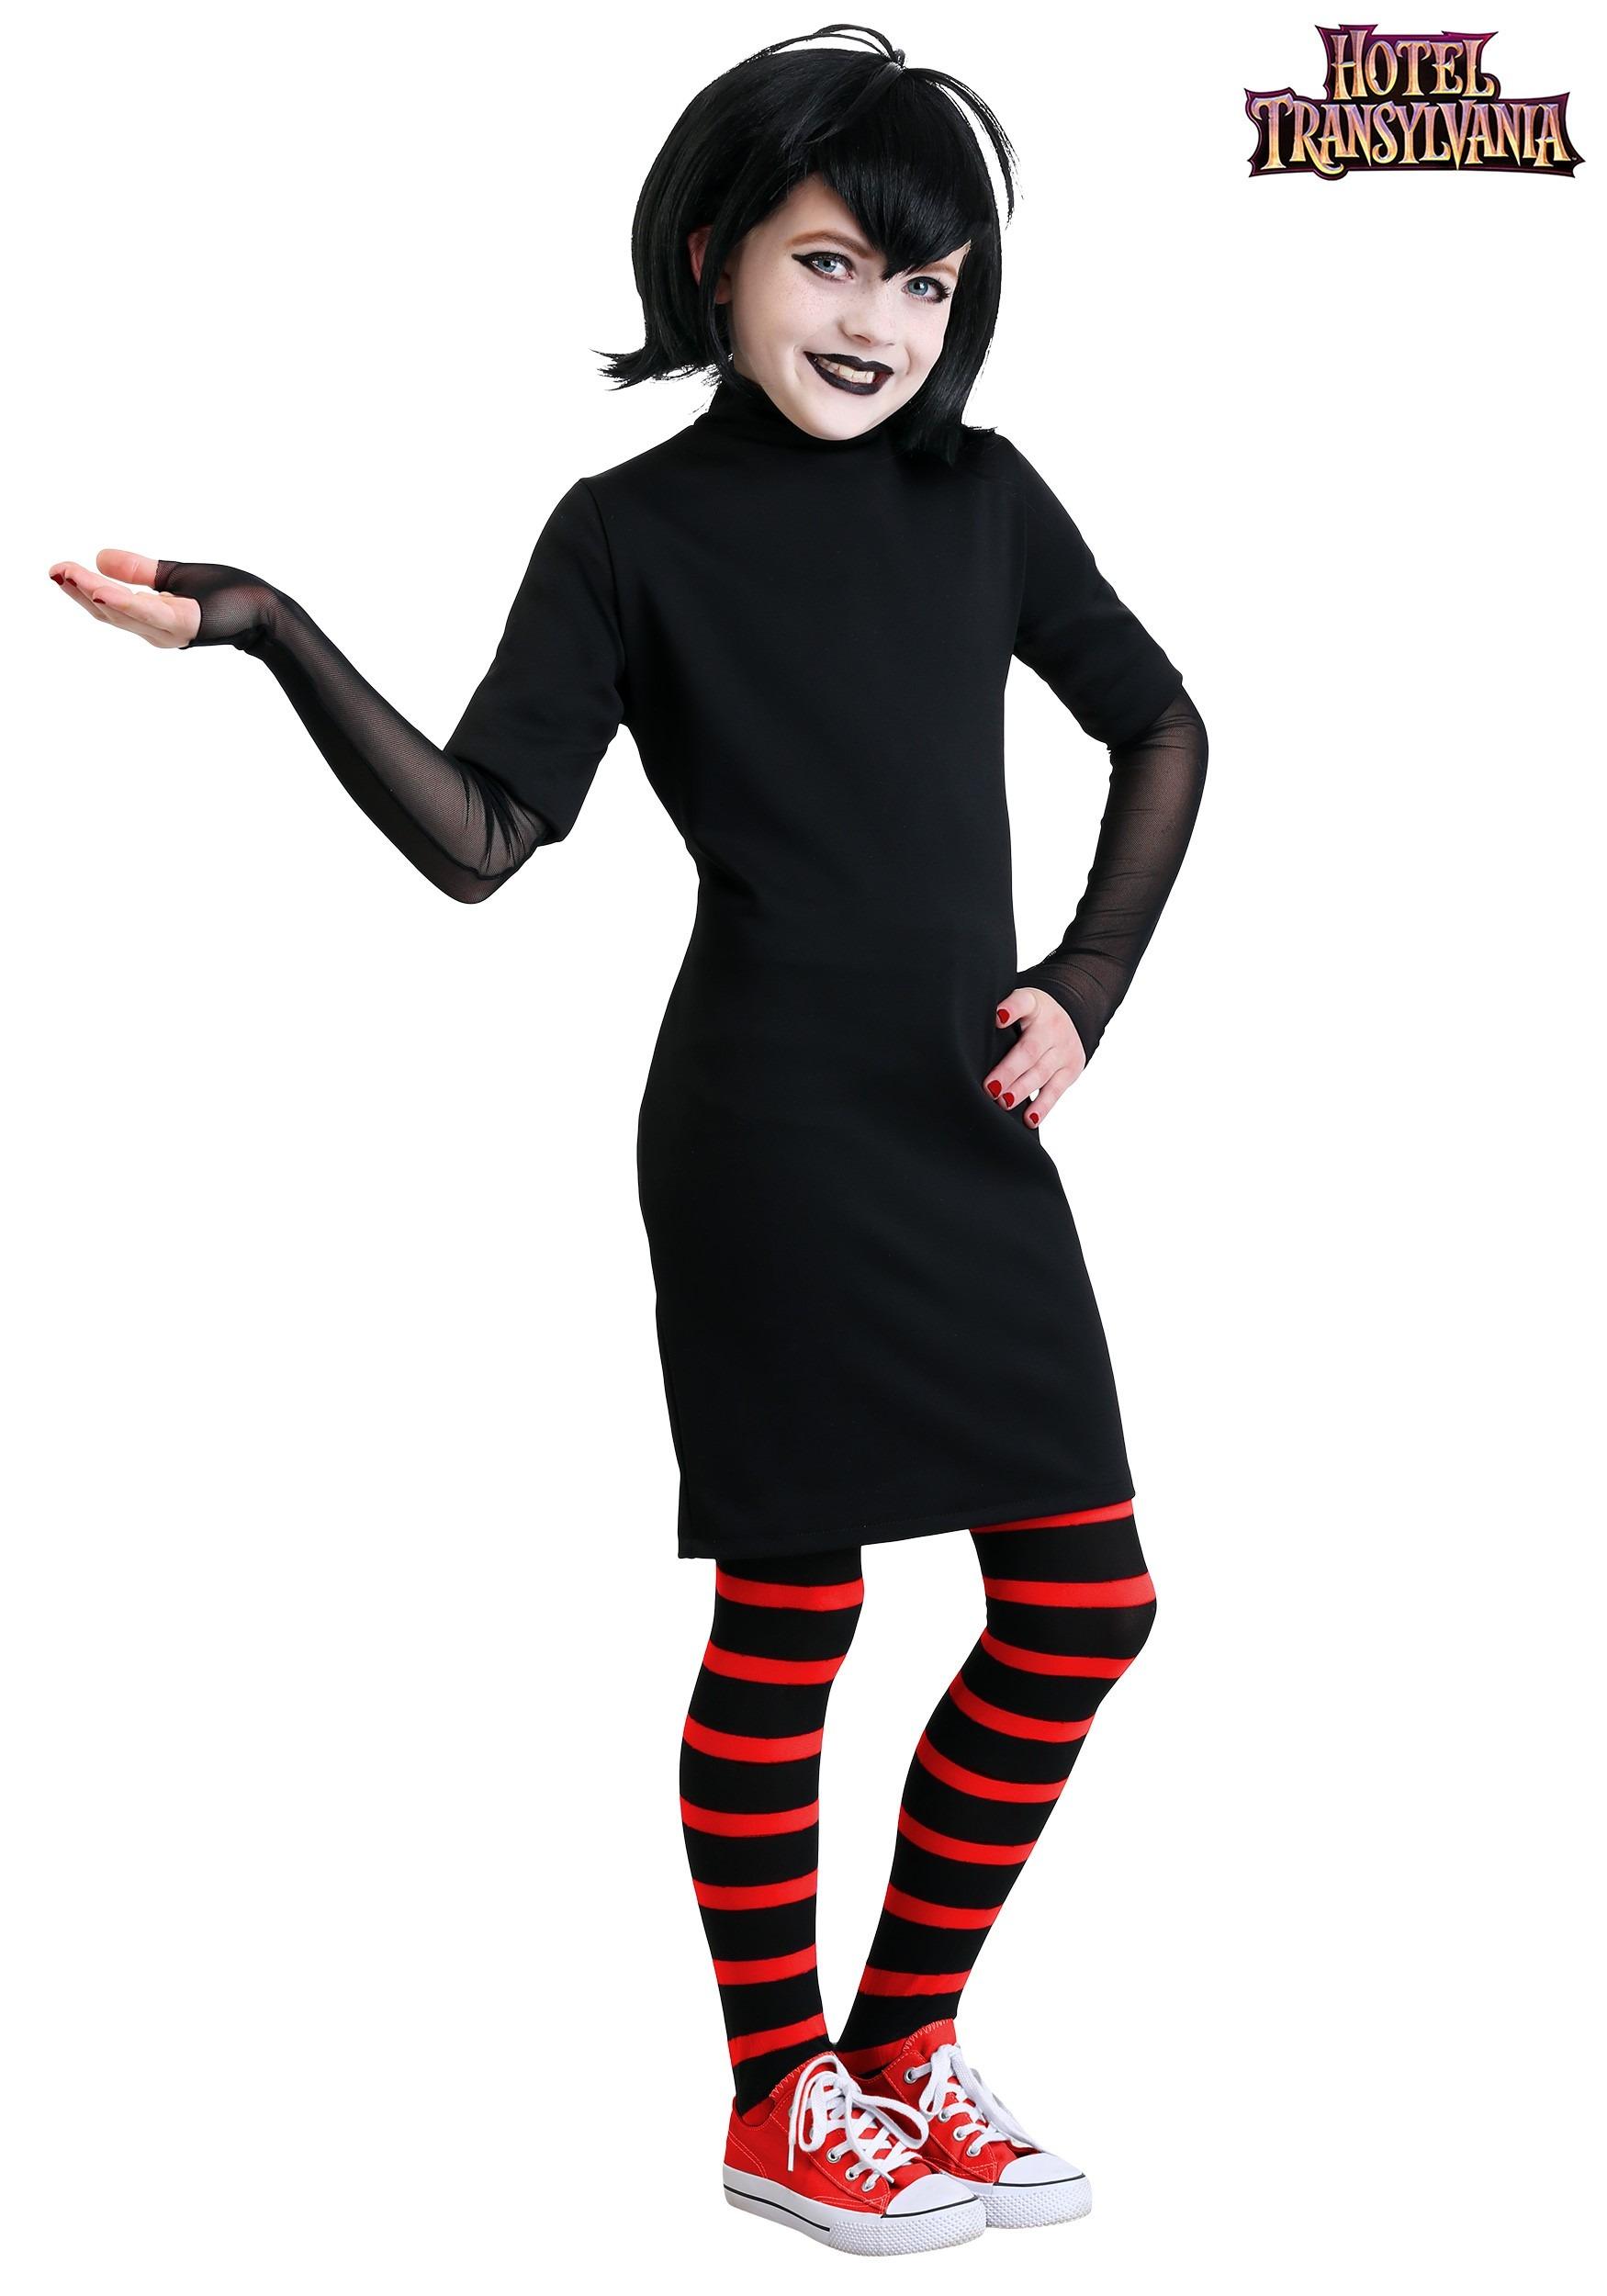 Costume Halloween Mavis.Kids Hotel Transylvania Mavis Costume